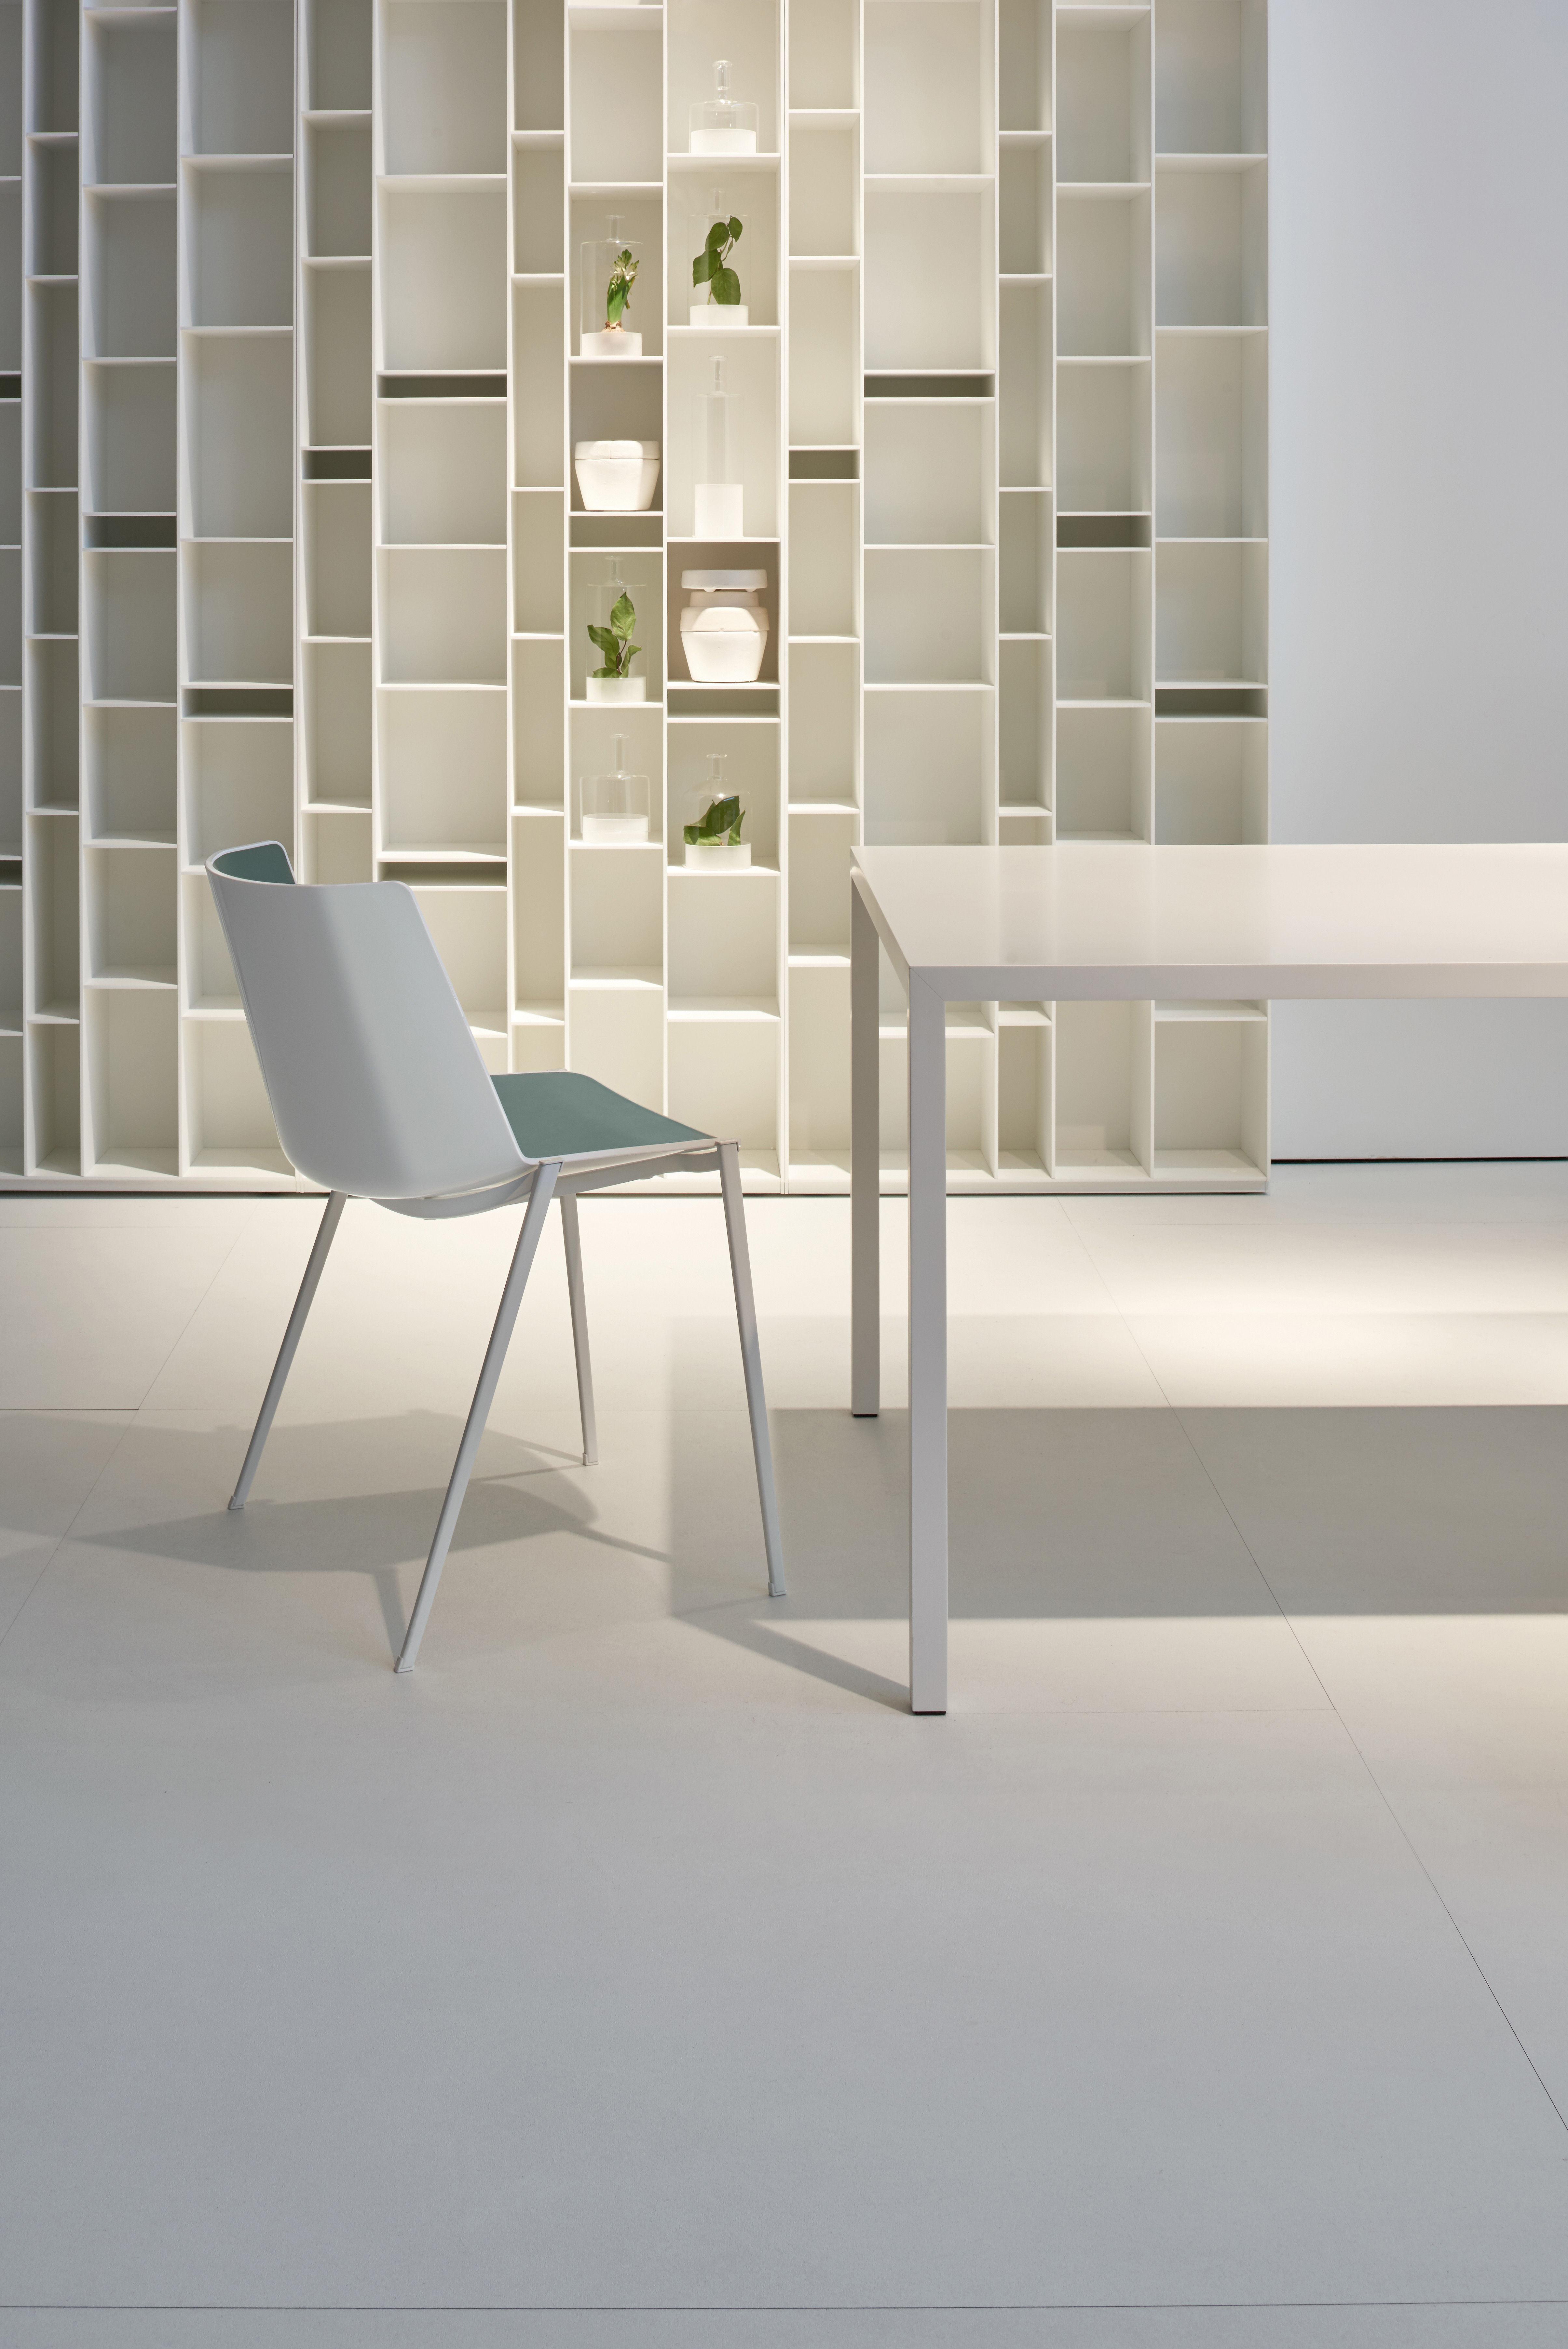 Scopri Sedia impilabile Aïku -/ Gambe metallo quadrate, Bianco & interno ...